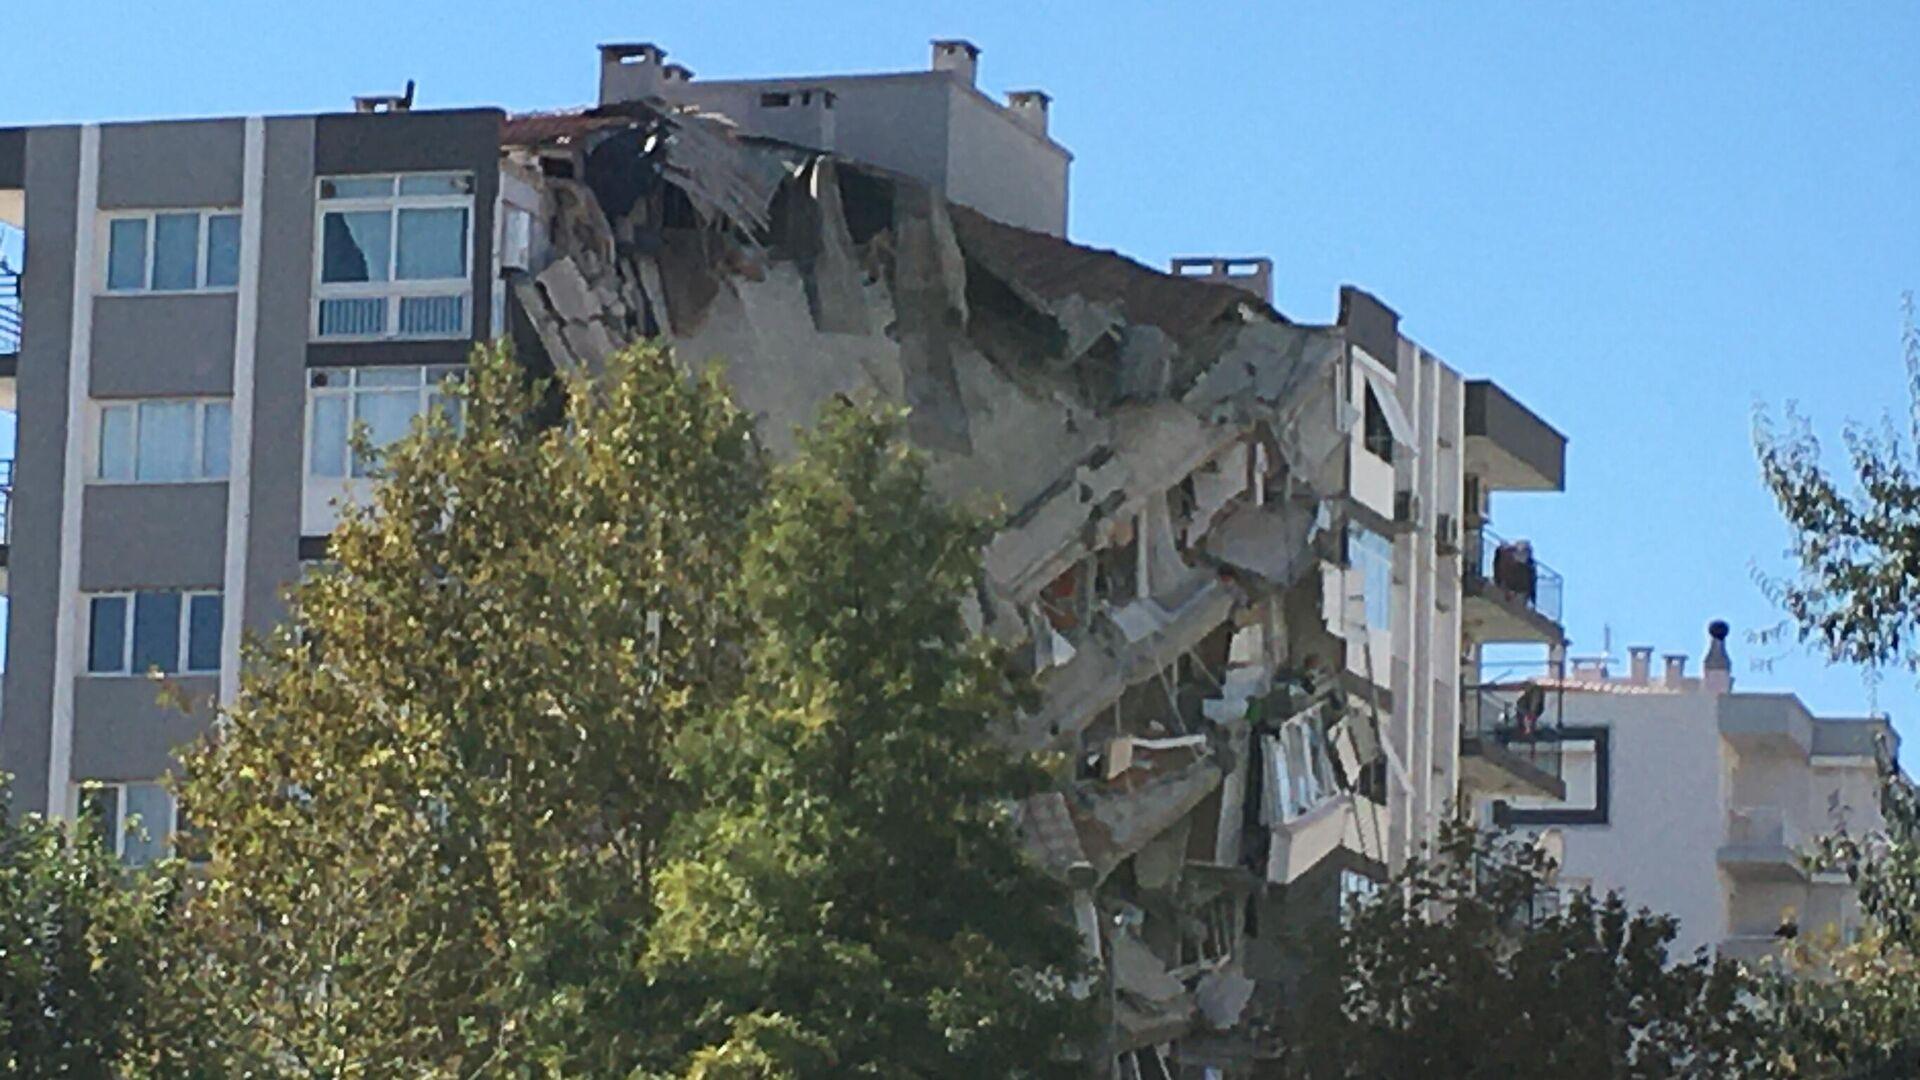 Последствия землетрясения в турецком Измире - РИА Новости, 1920, 01.11.2020